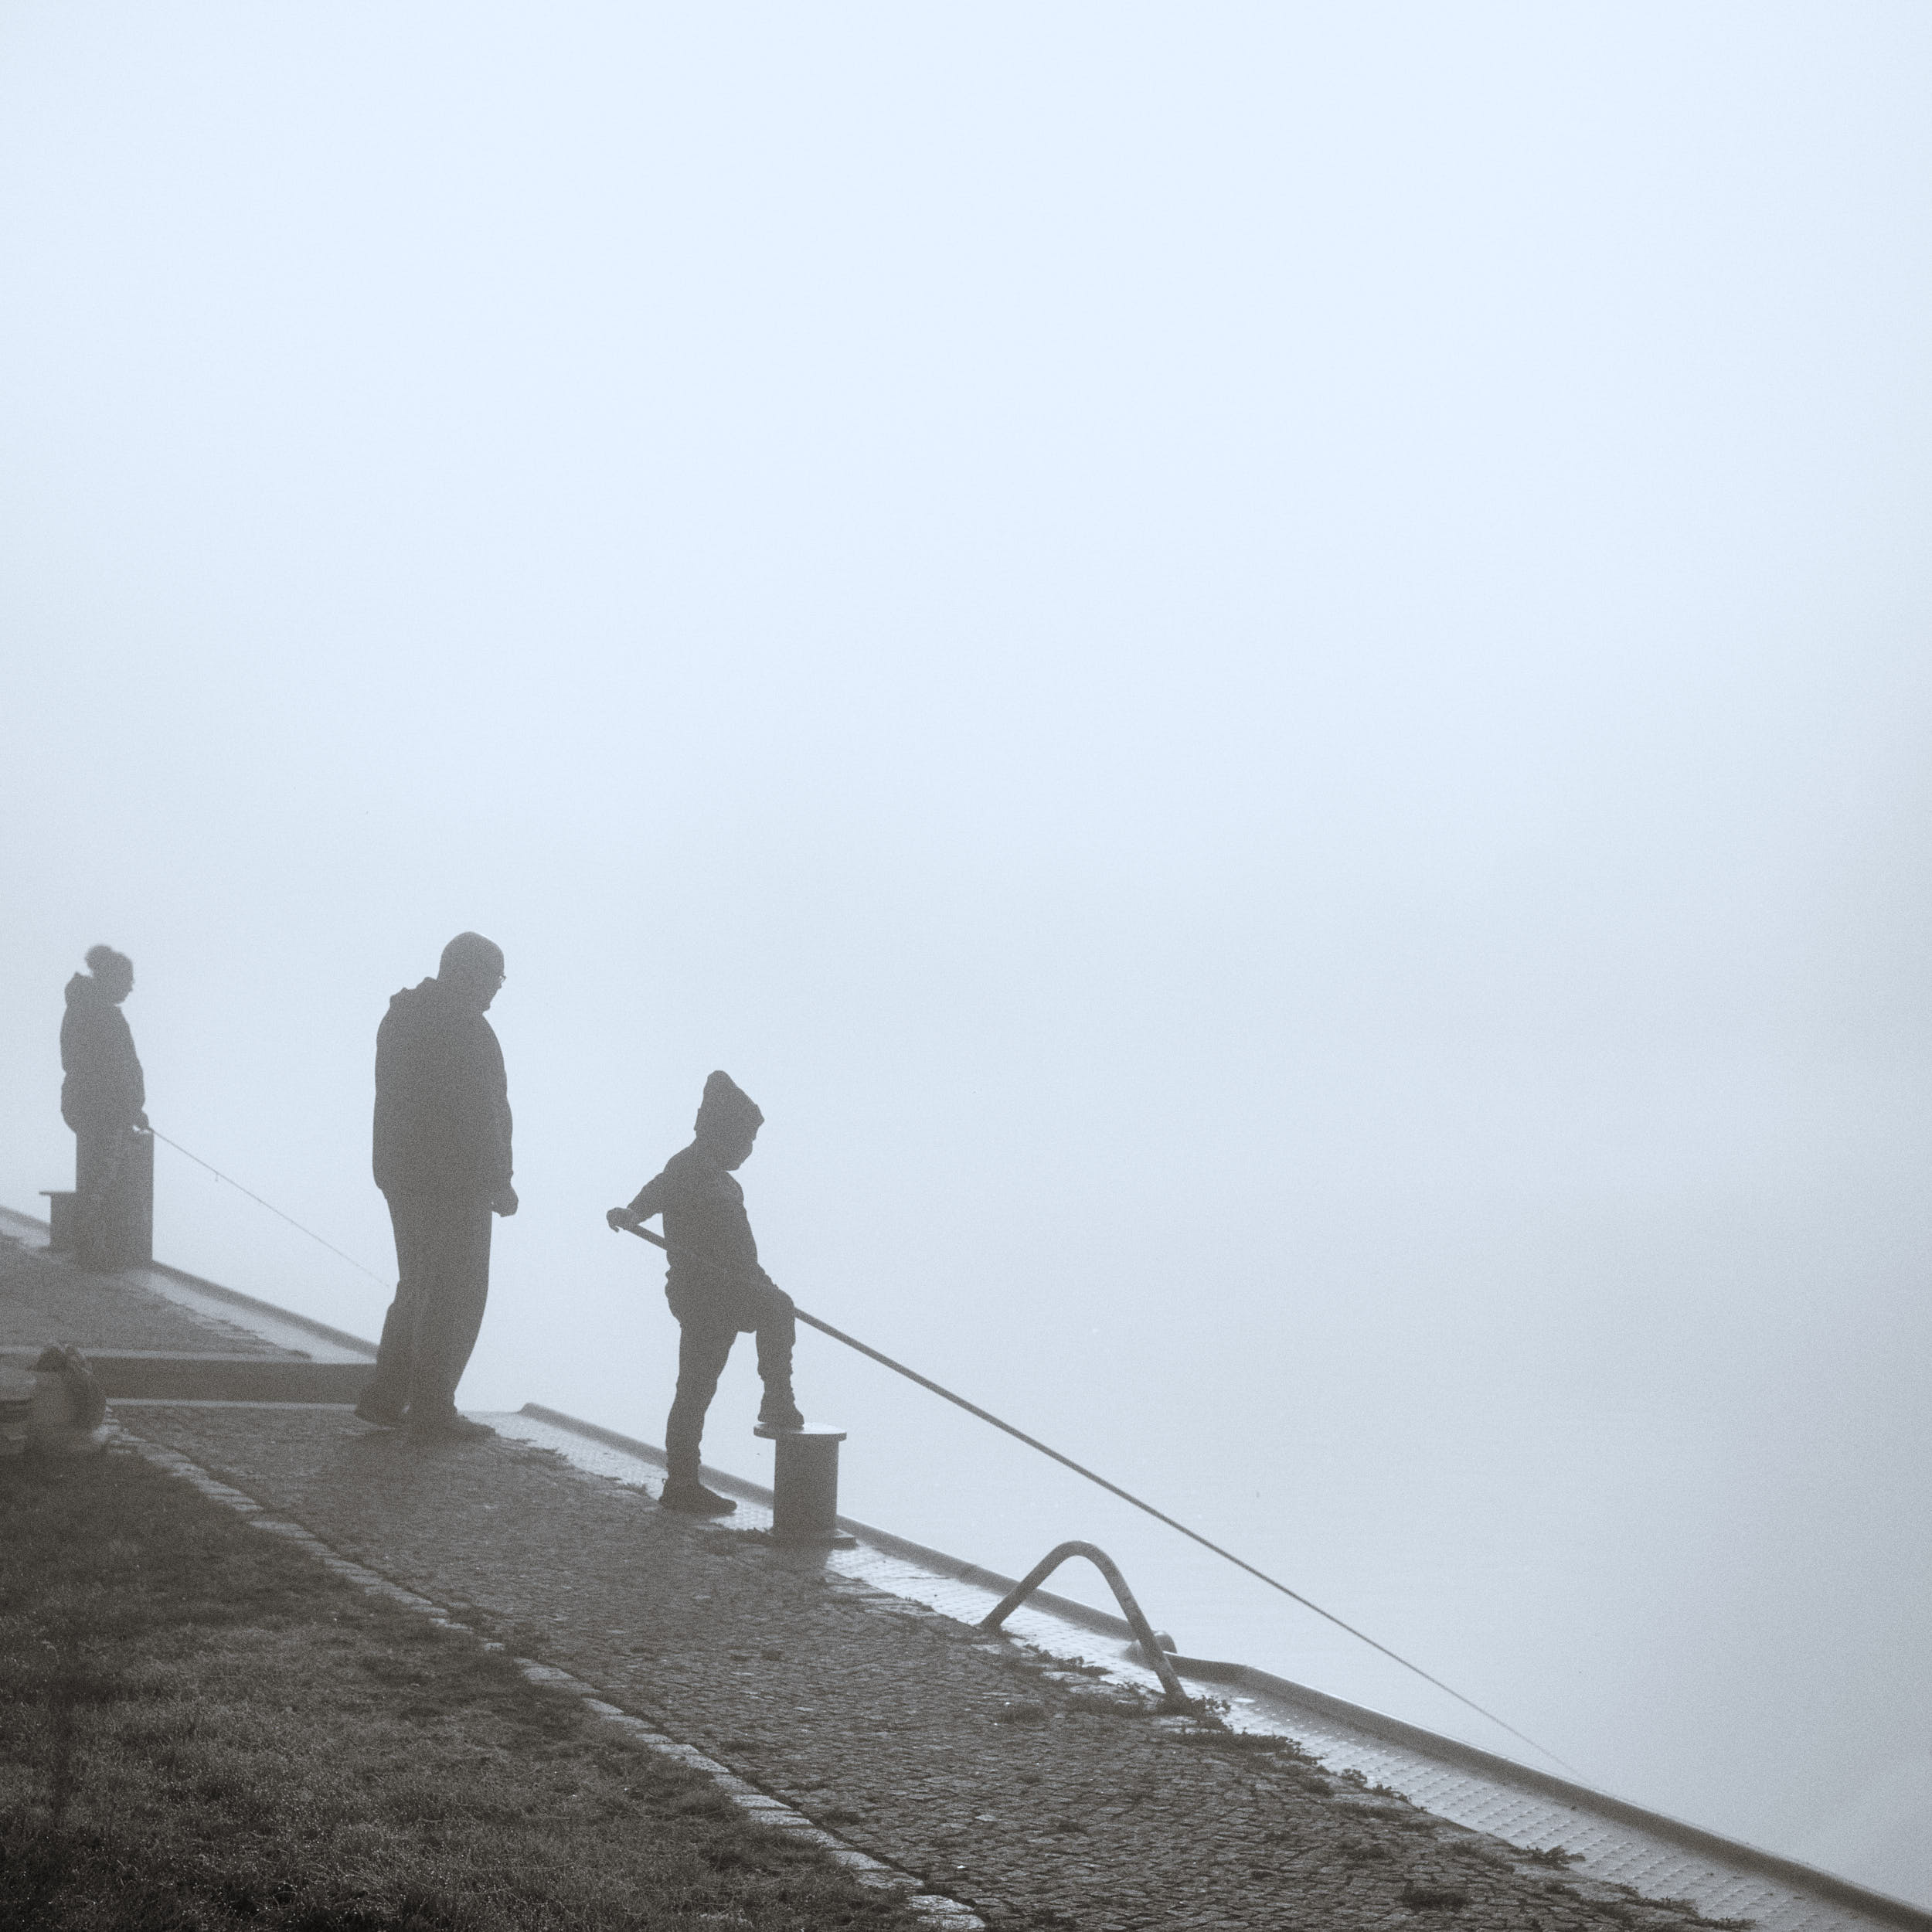 Angler an der Oder in Gartz